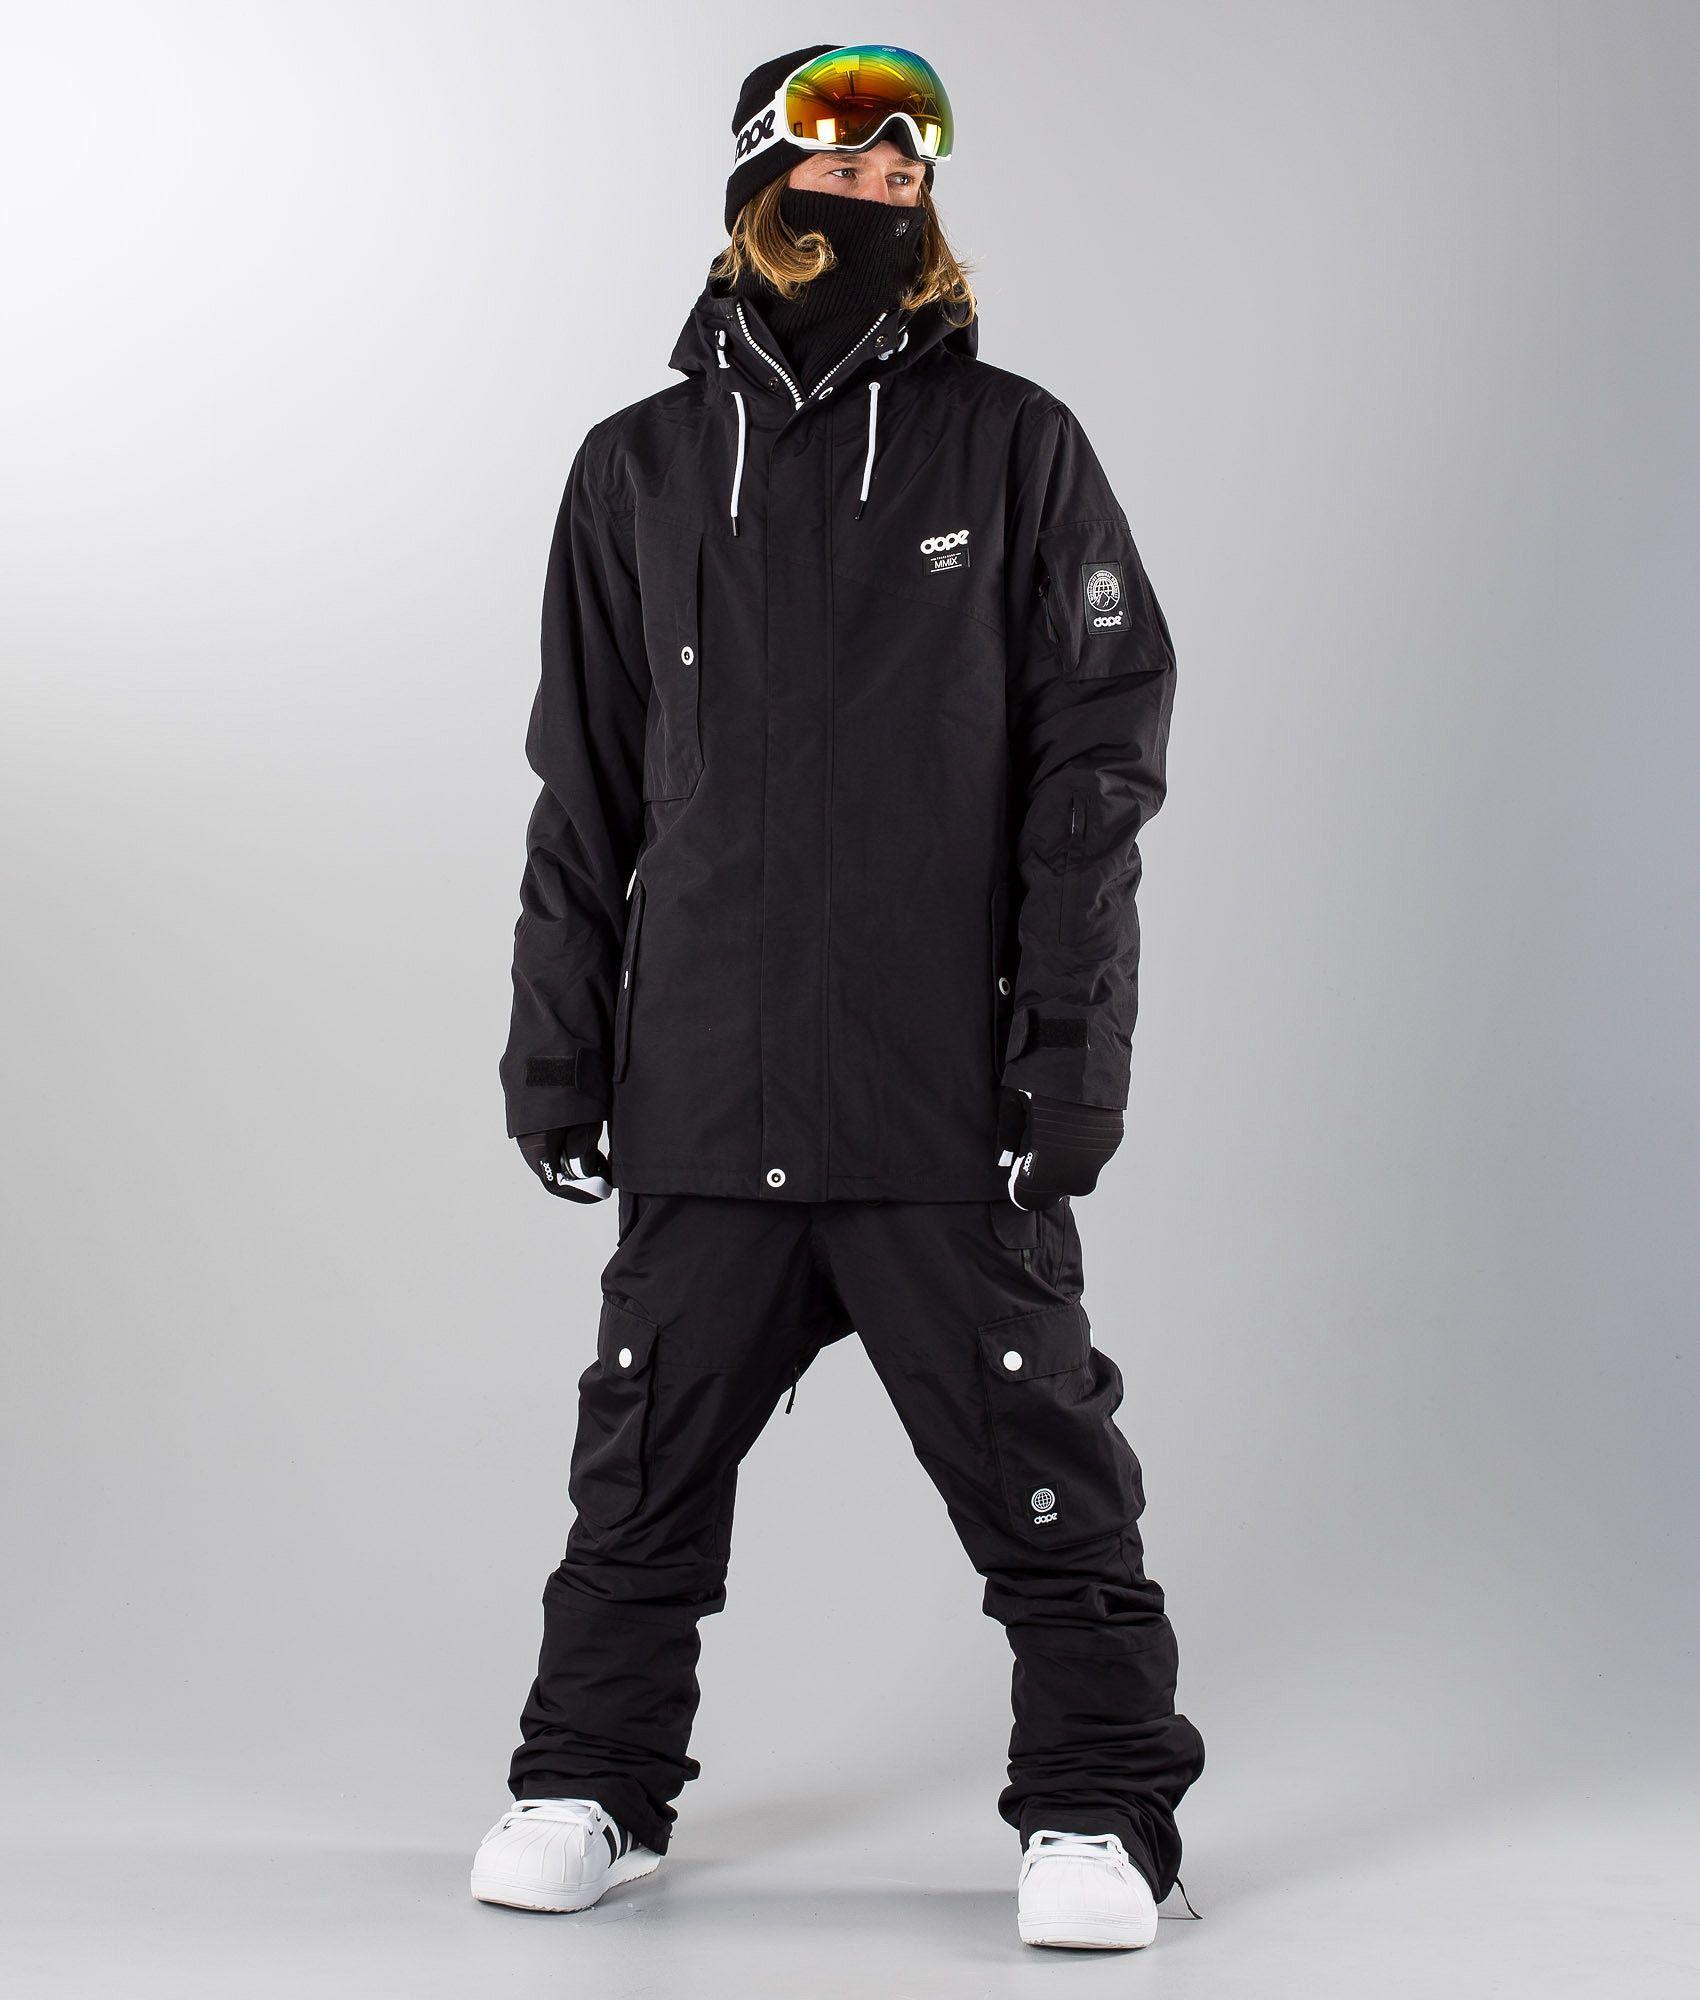 b1affa6d1de7 Dope Adept Snowboard Jacket Black Black